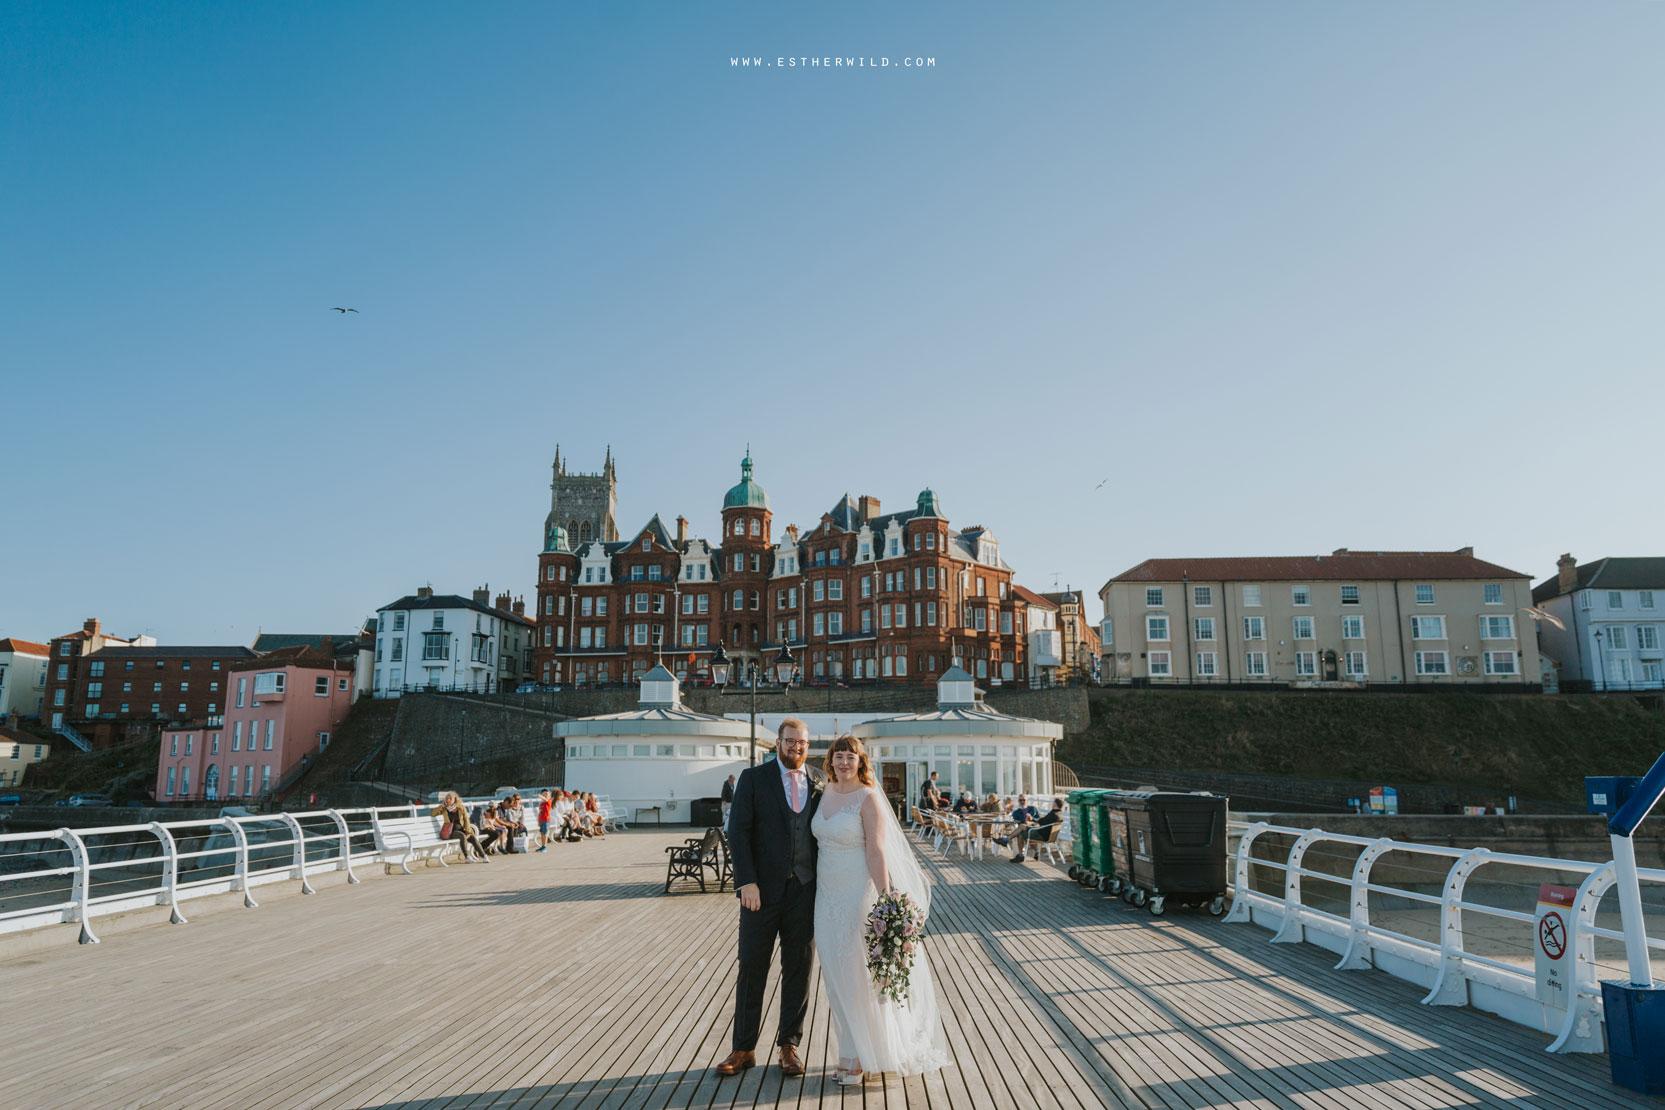 Cromer_Wedding_Beach_Outdoor_Ceremony_Norfolk_North_Lodge_Registry_Office_Rocket_House_Cafe_Cromer_Pier_IMG_4655_IMGL8399.jpg